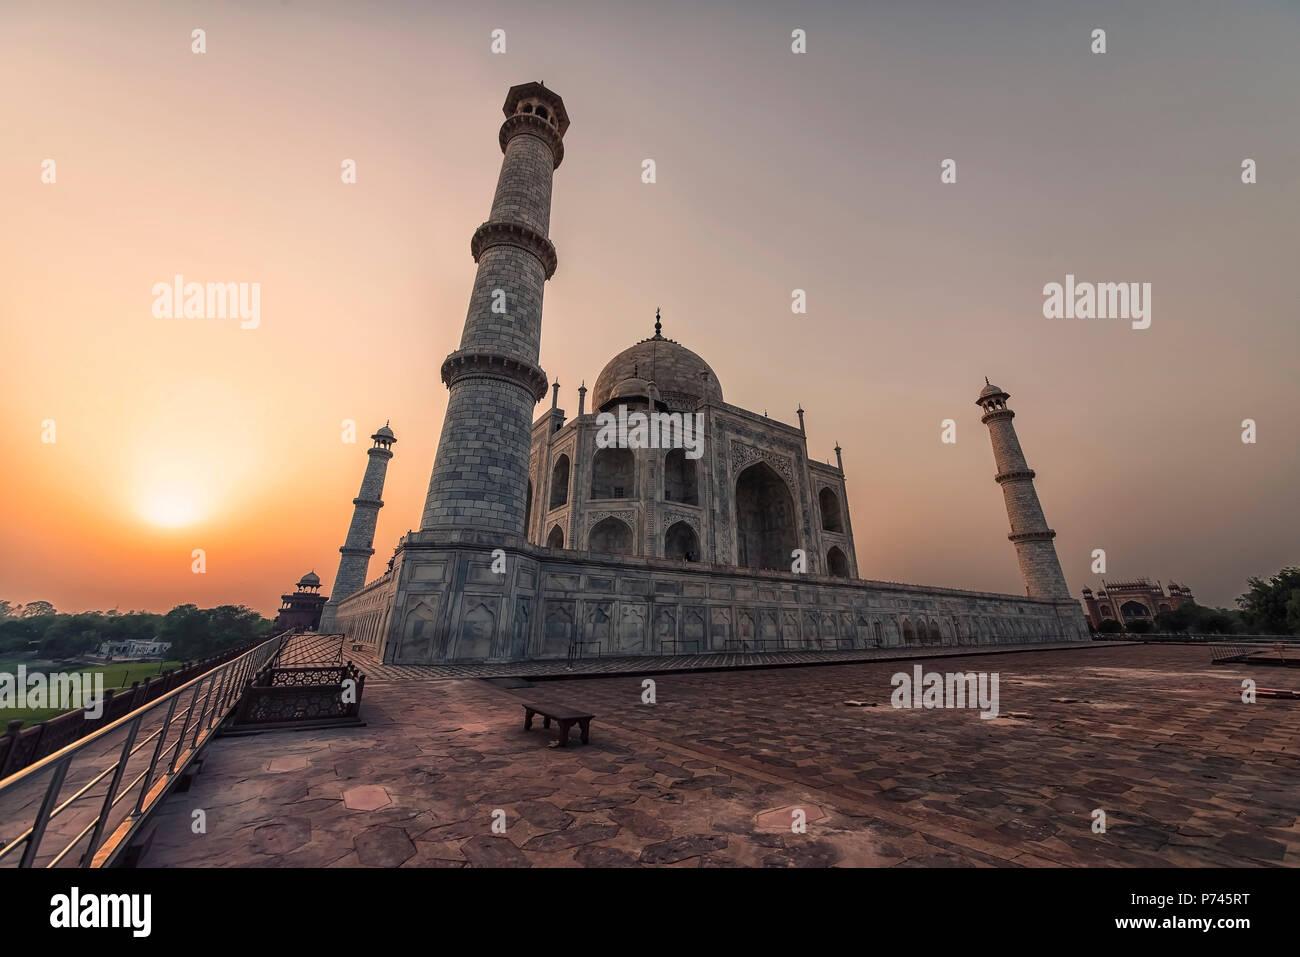 Taj Mahal di sunrise, luce di Agra, India Immagini Stock